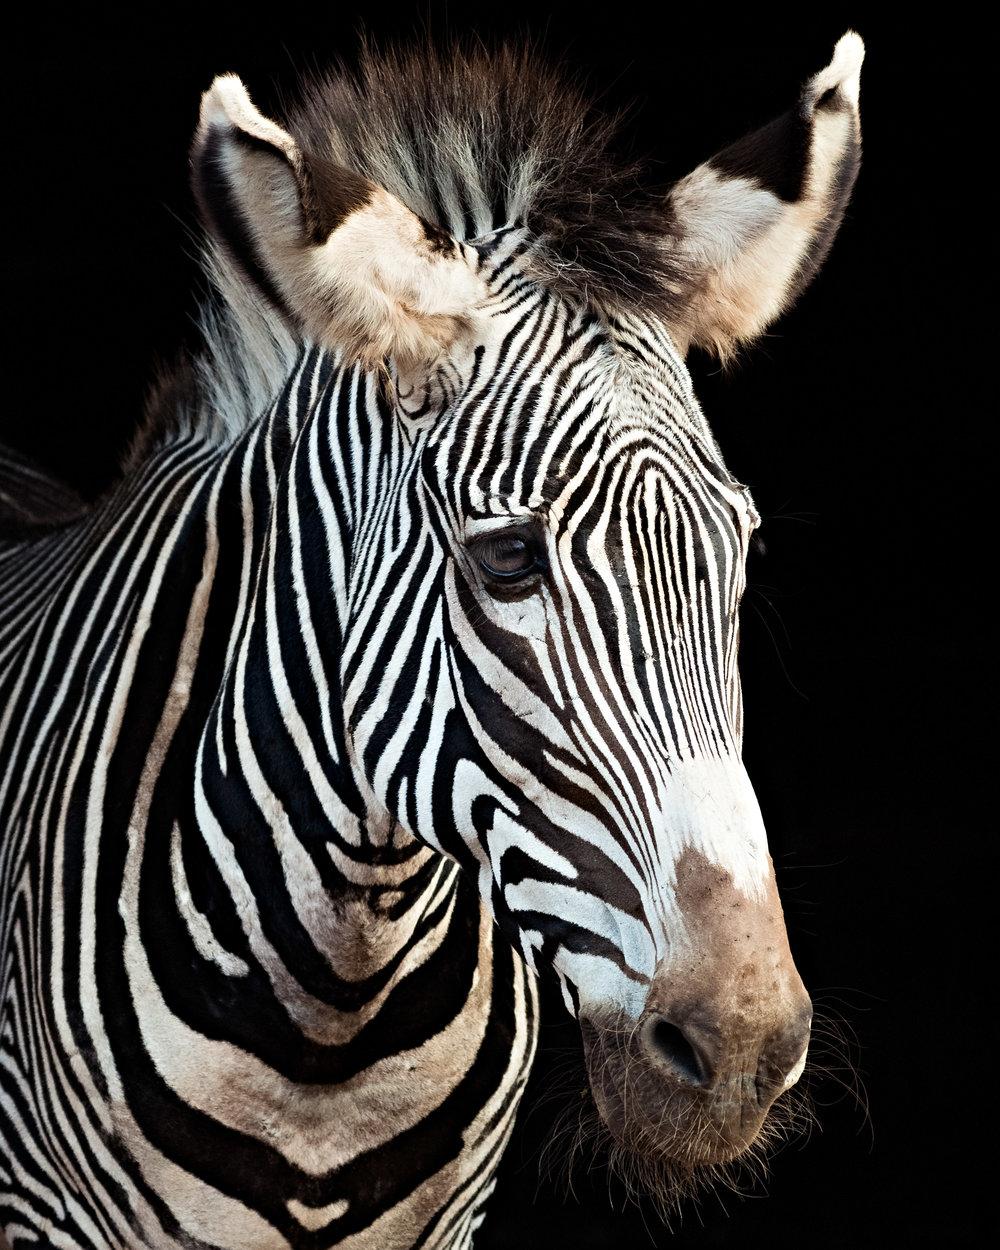 Zebra-portrait-pierre-melion (1 of 1).jpg